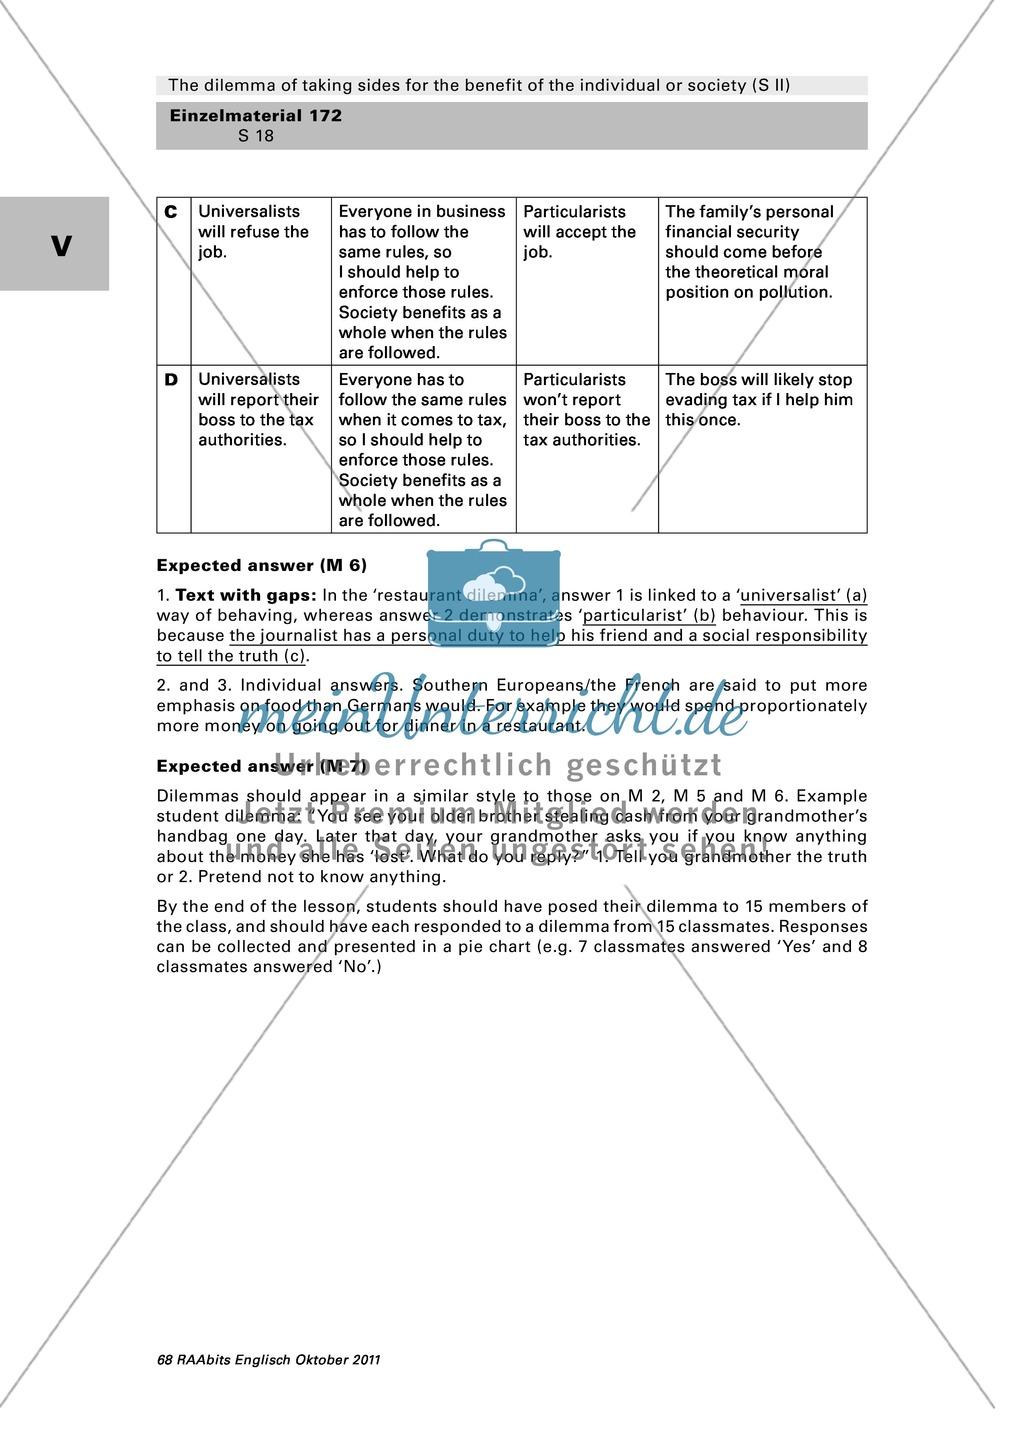 A Classroom Survey On Moral Dilemmas Worksheet With